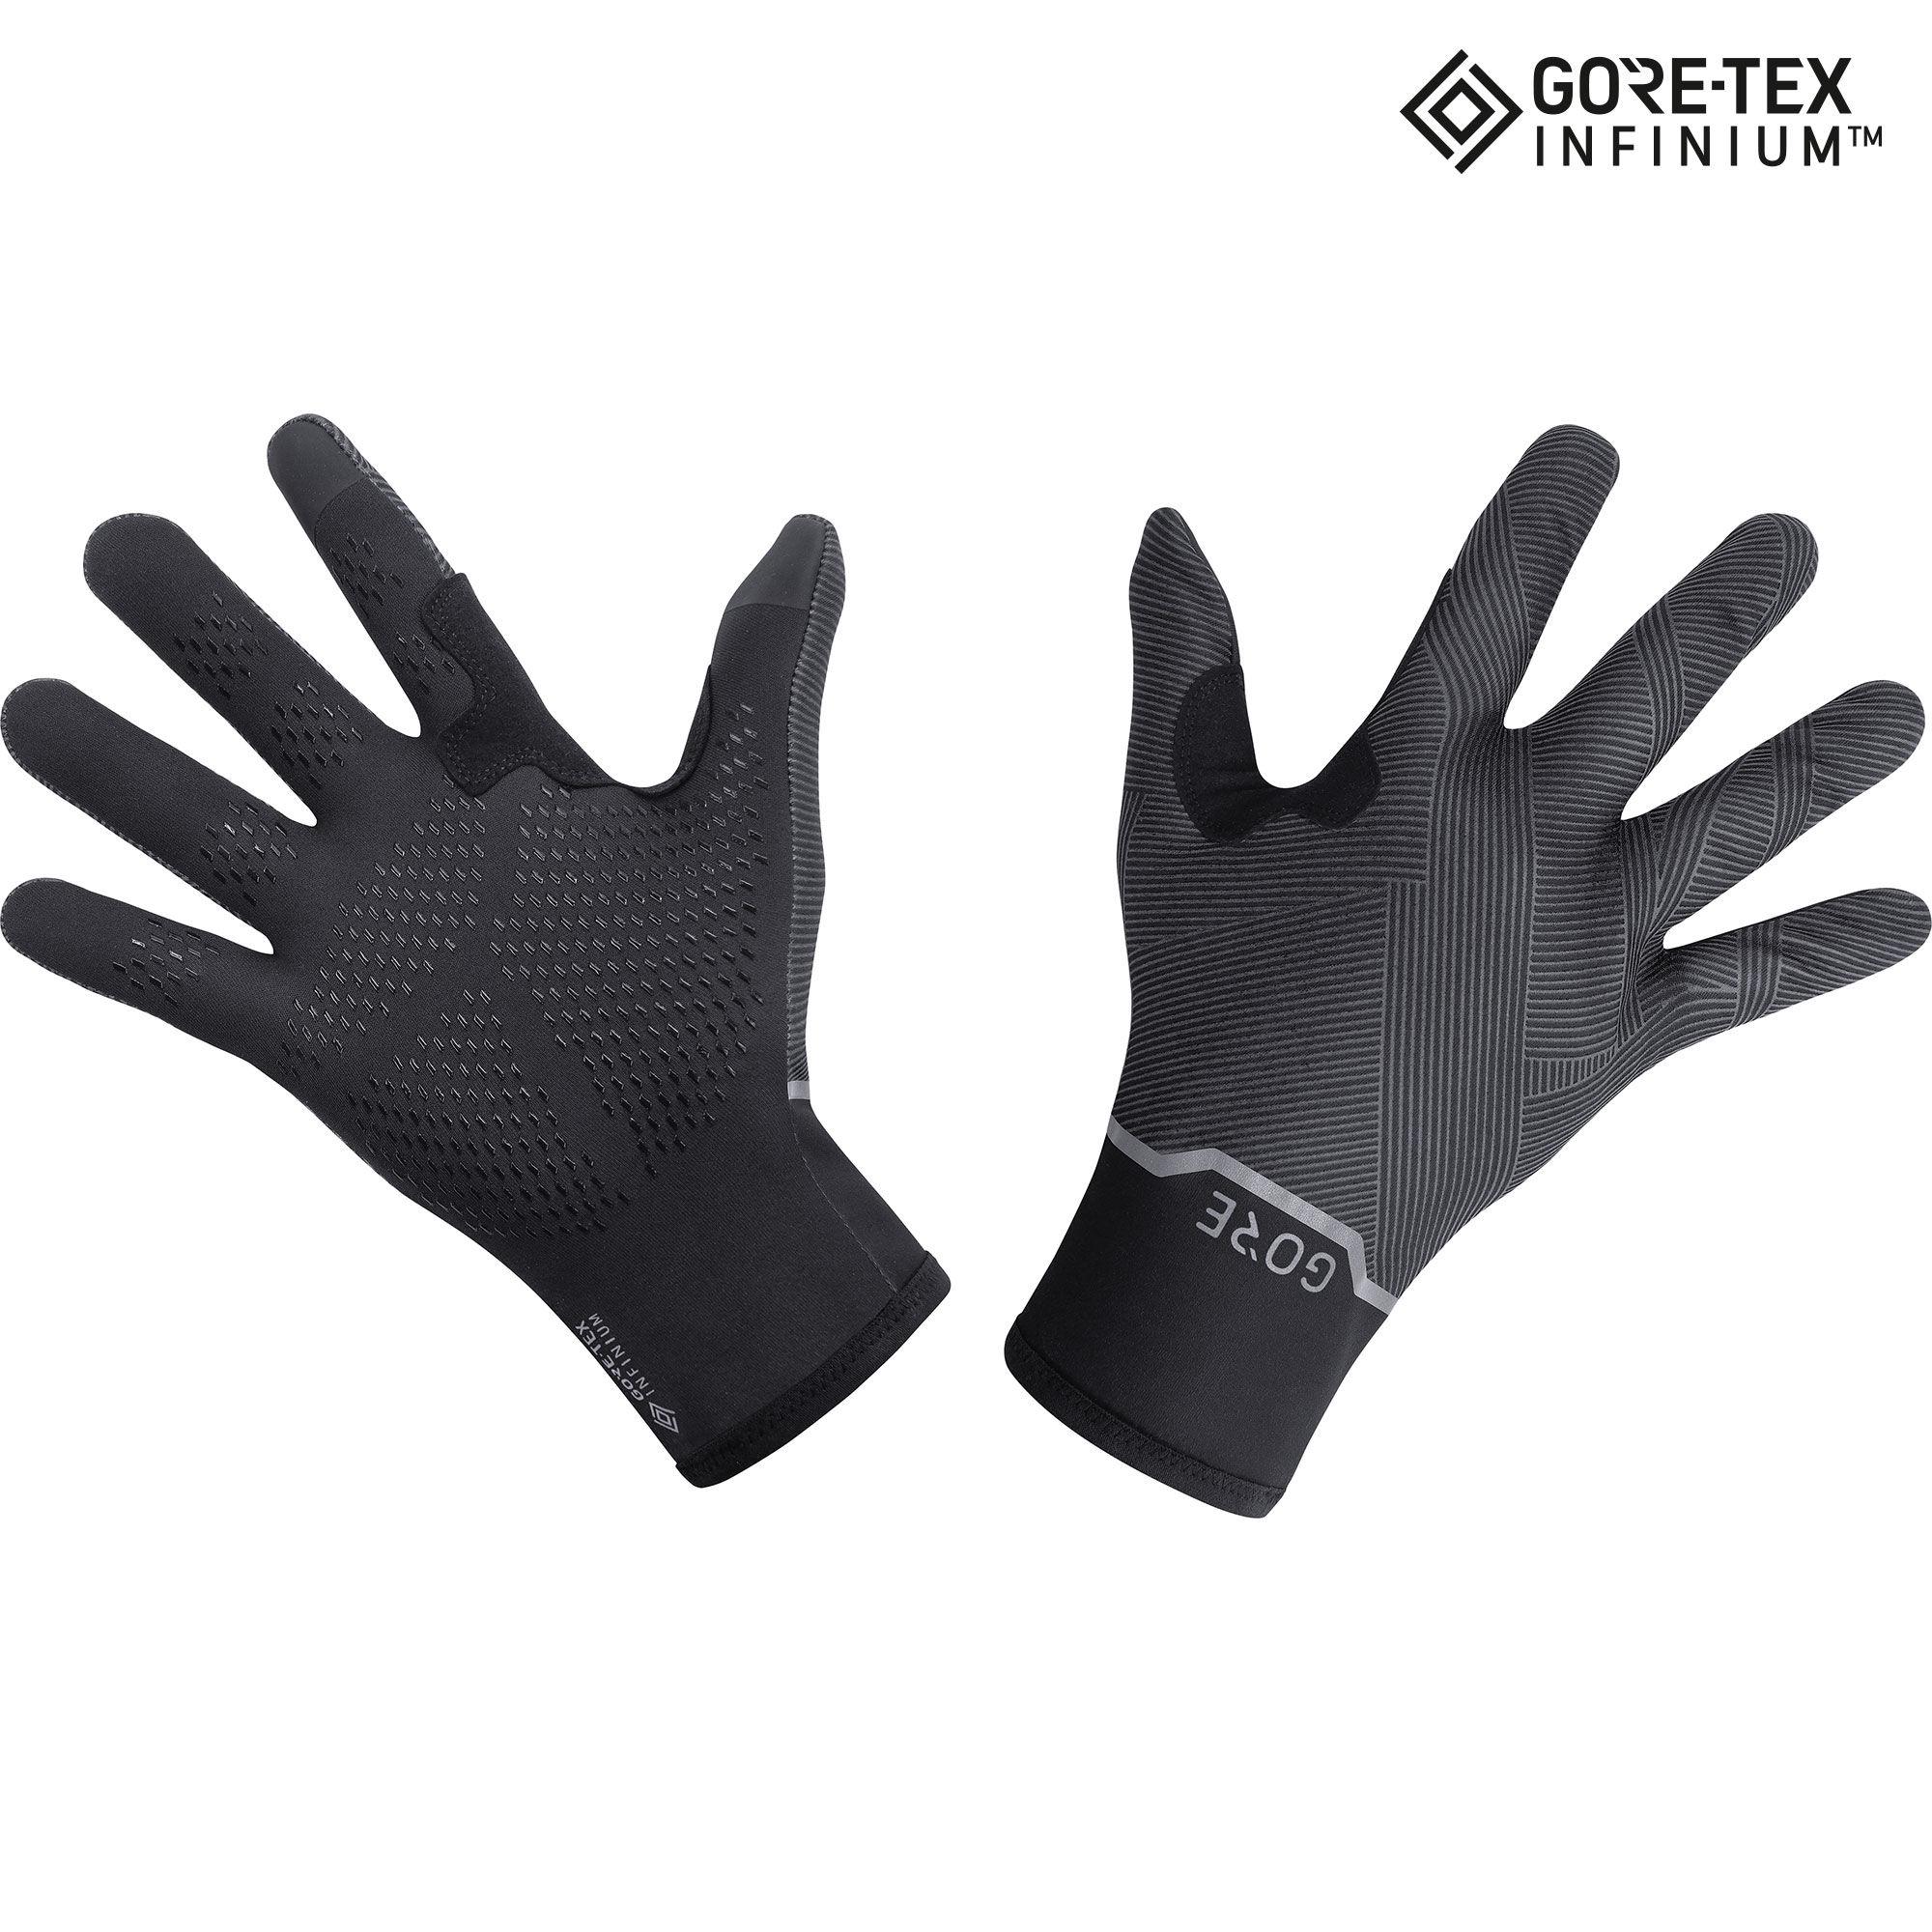 Gore Gore-Tex Infinium Mid Glove Strech (Black)